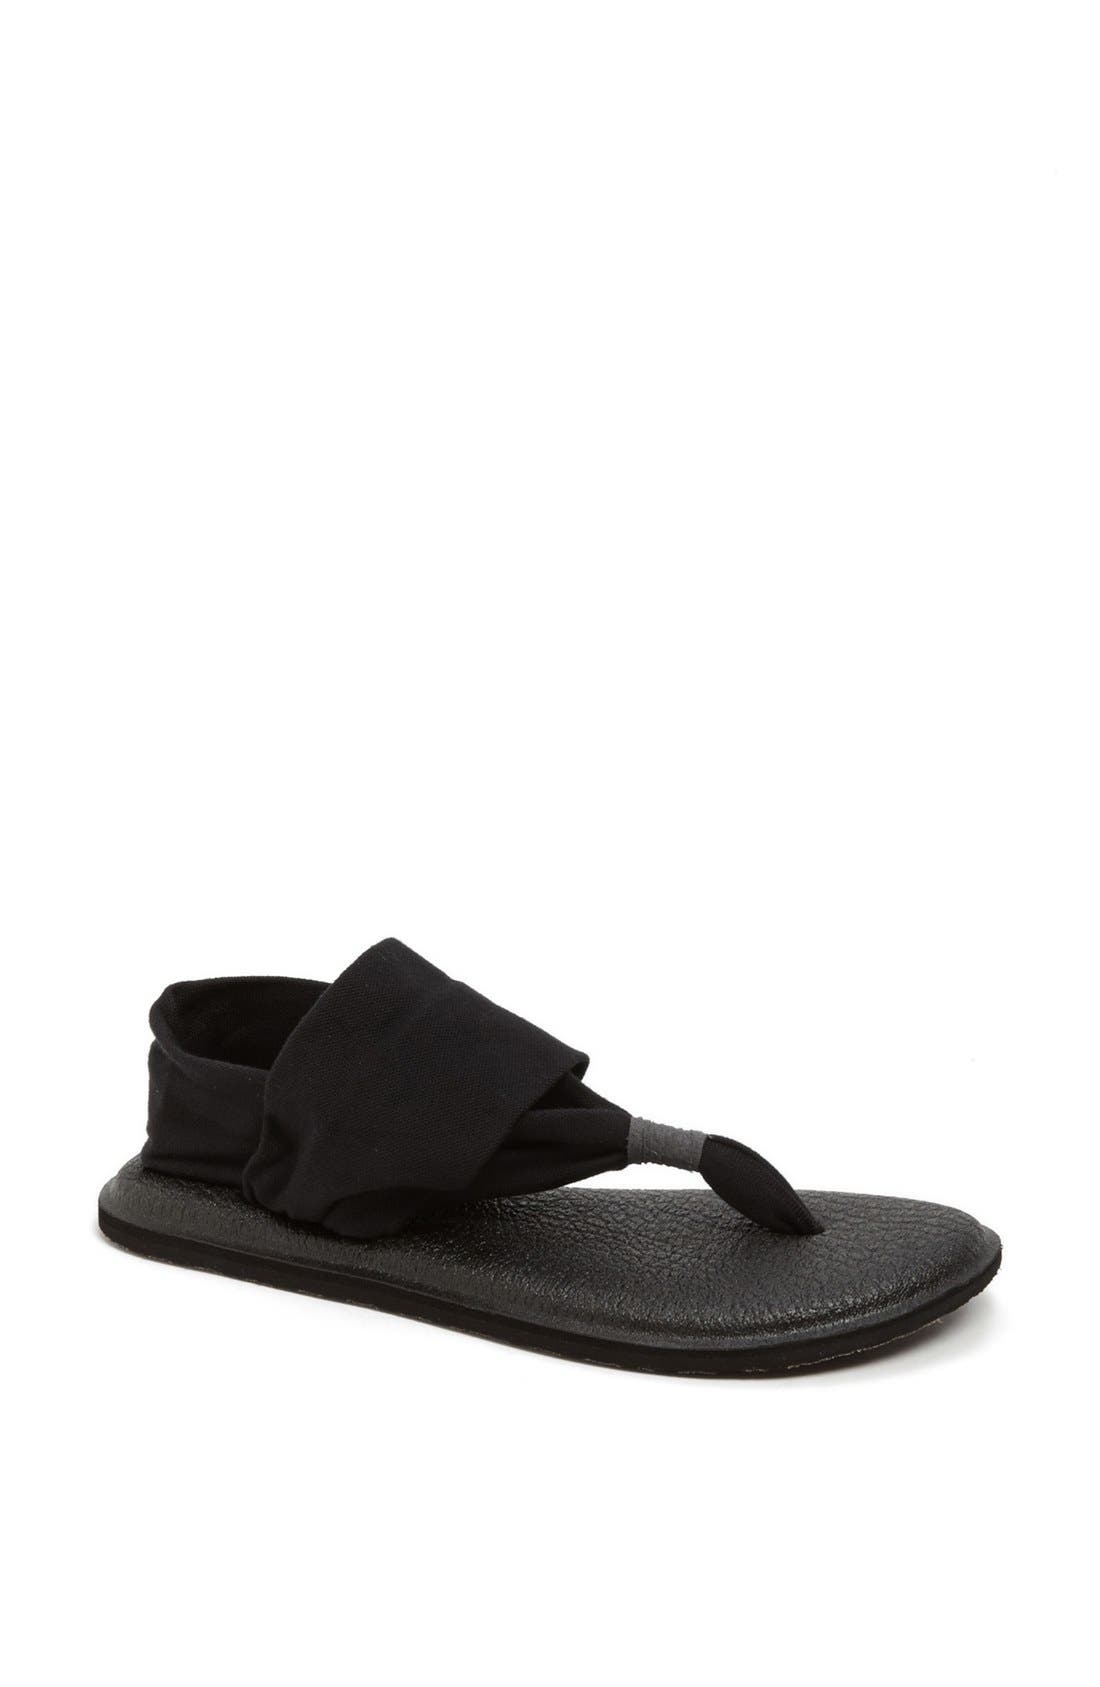 'Yoga Sling 2' Sandal,                         Main,                         color, BLACK